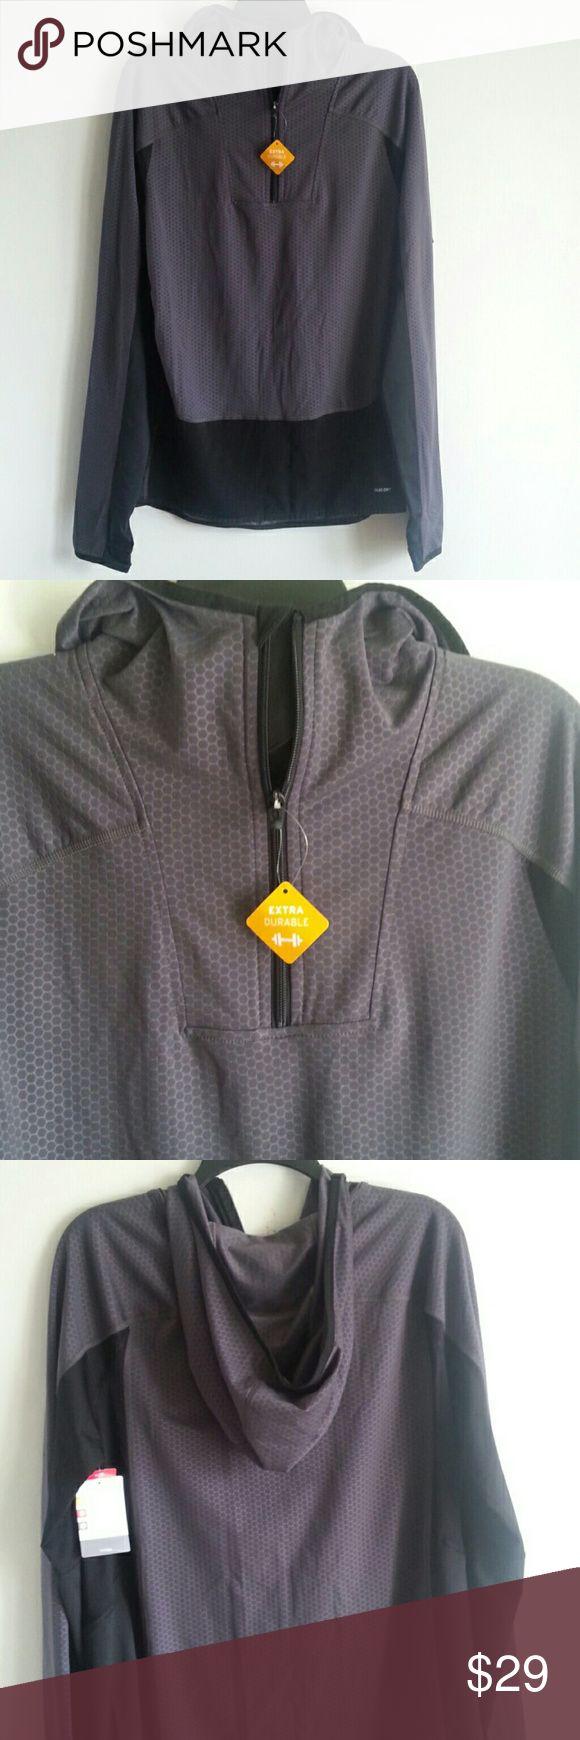 New Champion DUO DRY org$39.99 New Champion DUO DRY  GREY & BLACK  Size  M Champion Jackets & Coats Performance Jackets